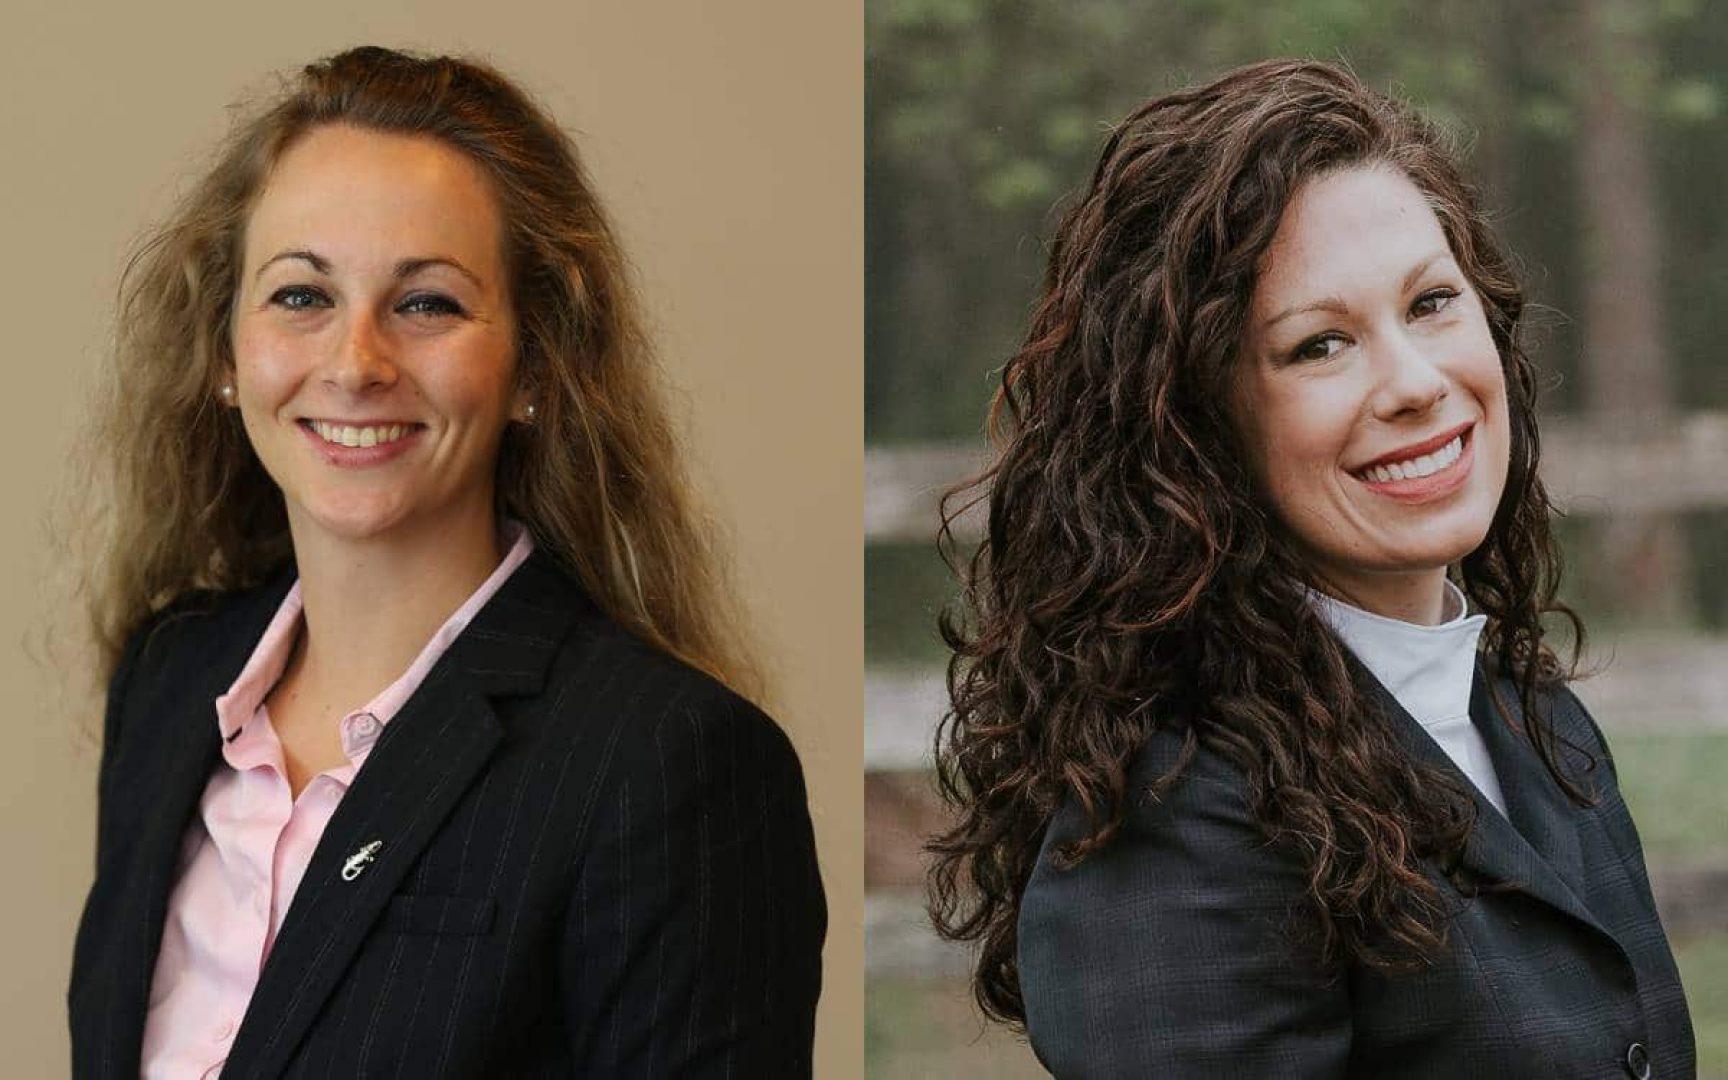 Caroline Smith and Kate O'Hara